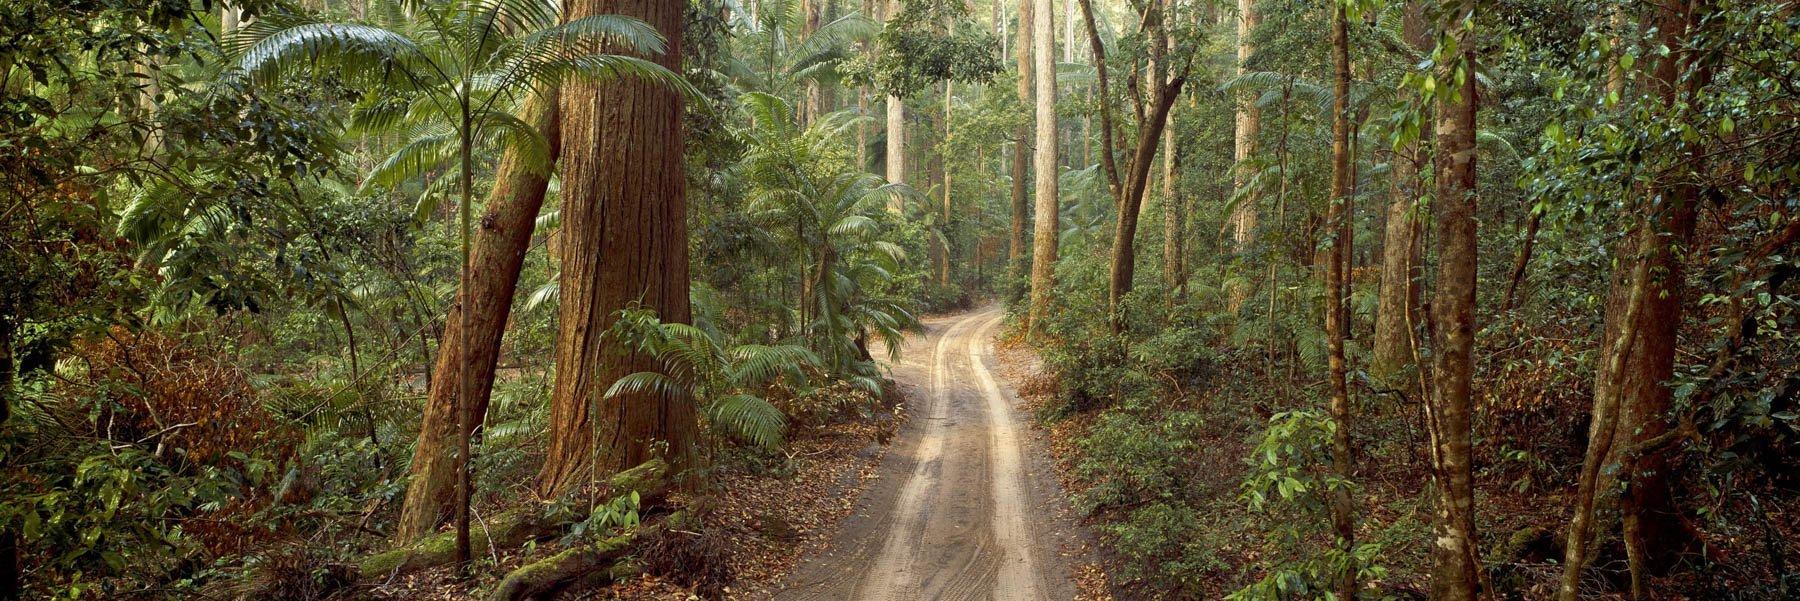 Ferns amongst the rainforest trees in Pile Valley, Fraser Island, Qld, Australia.